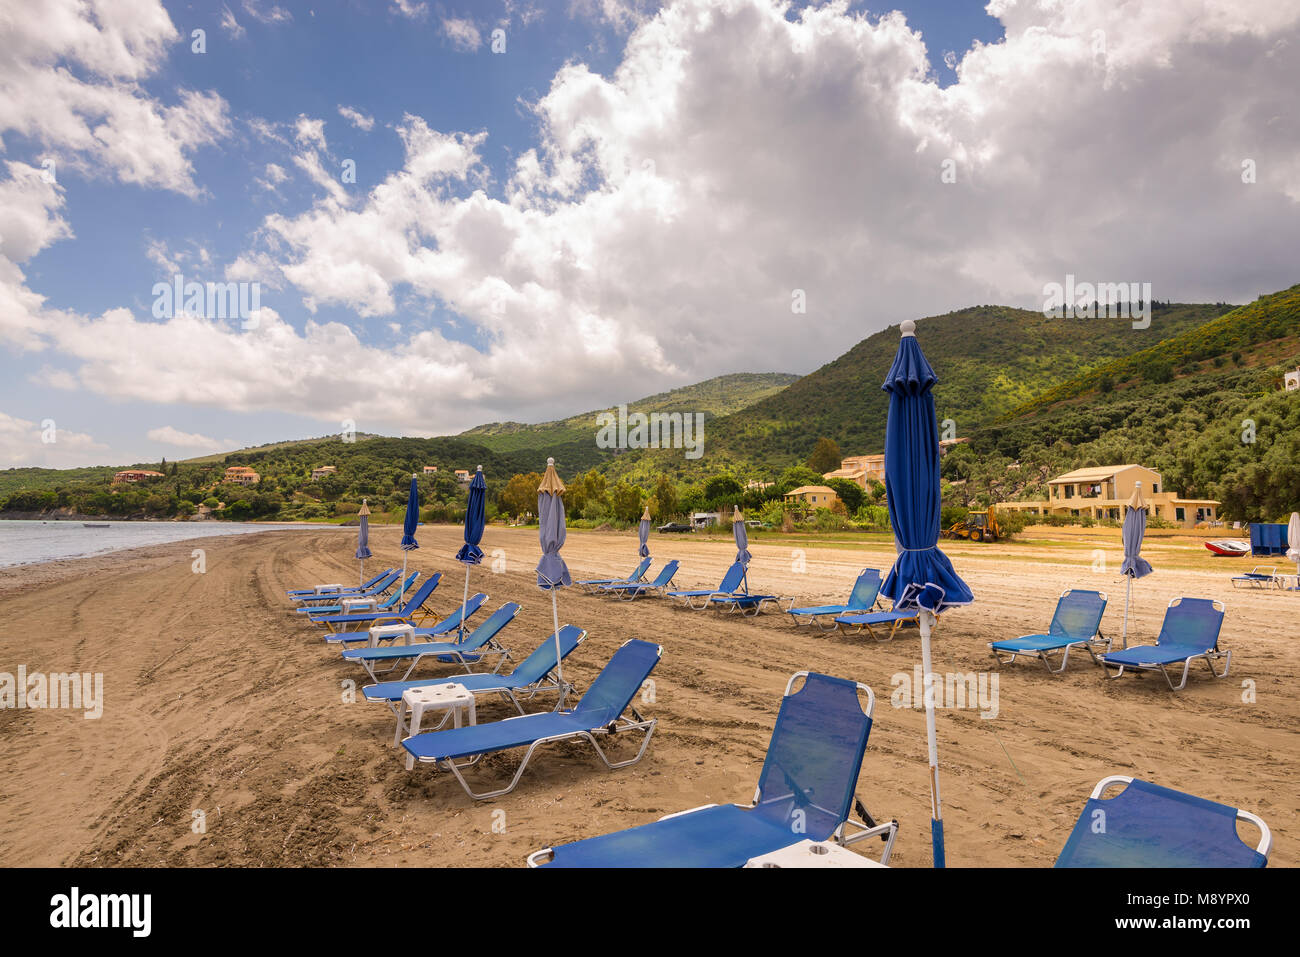 Sunbeds and umbrellas on Kalamaki beach, also now as Apraos beach near Kassiopi on Corfu island. Greece. - Stock Image